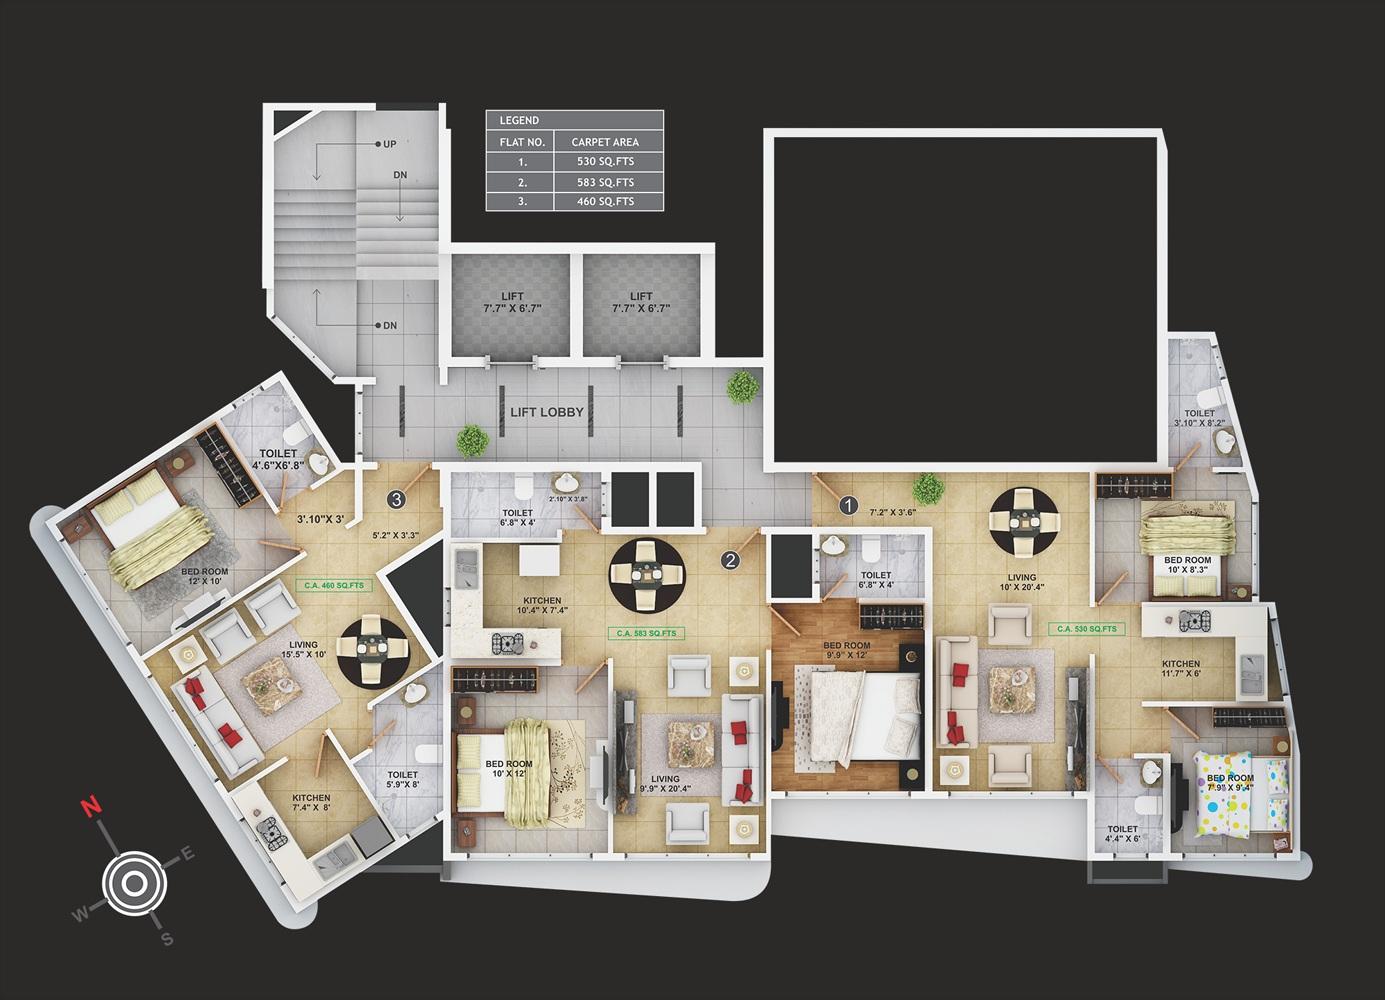 sanghvi aaditya pearl project floor plans1